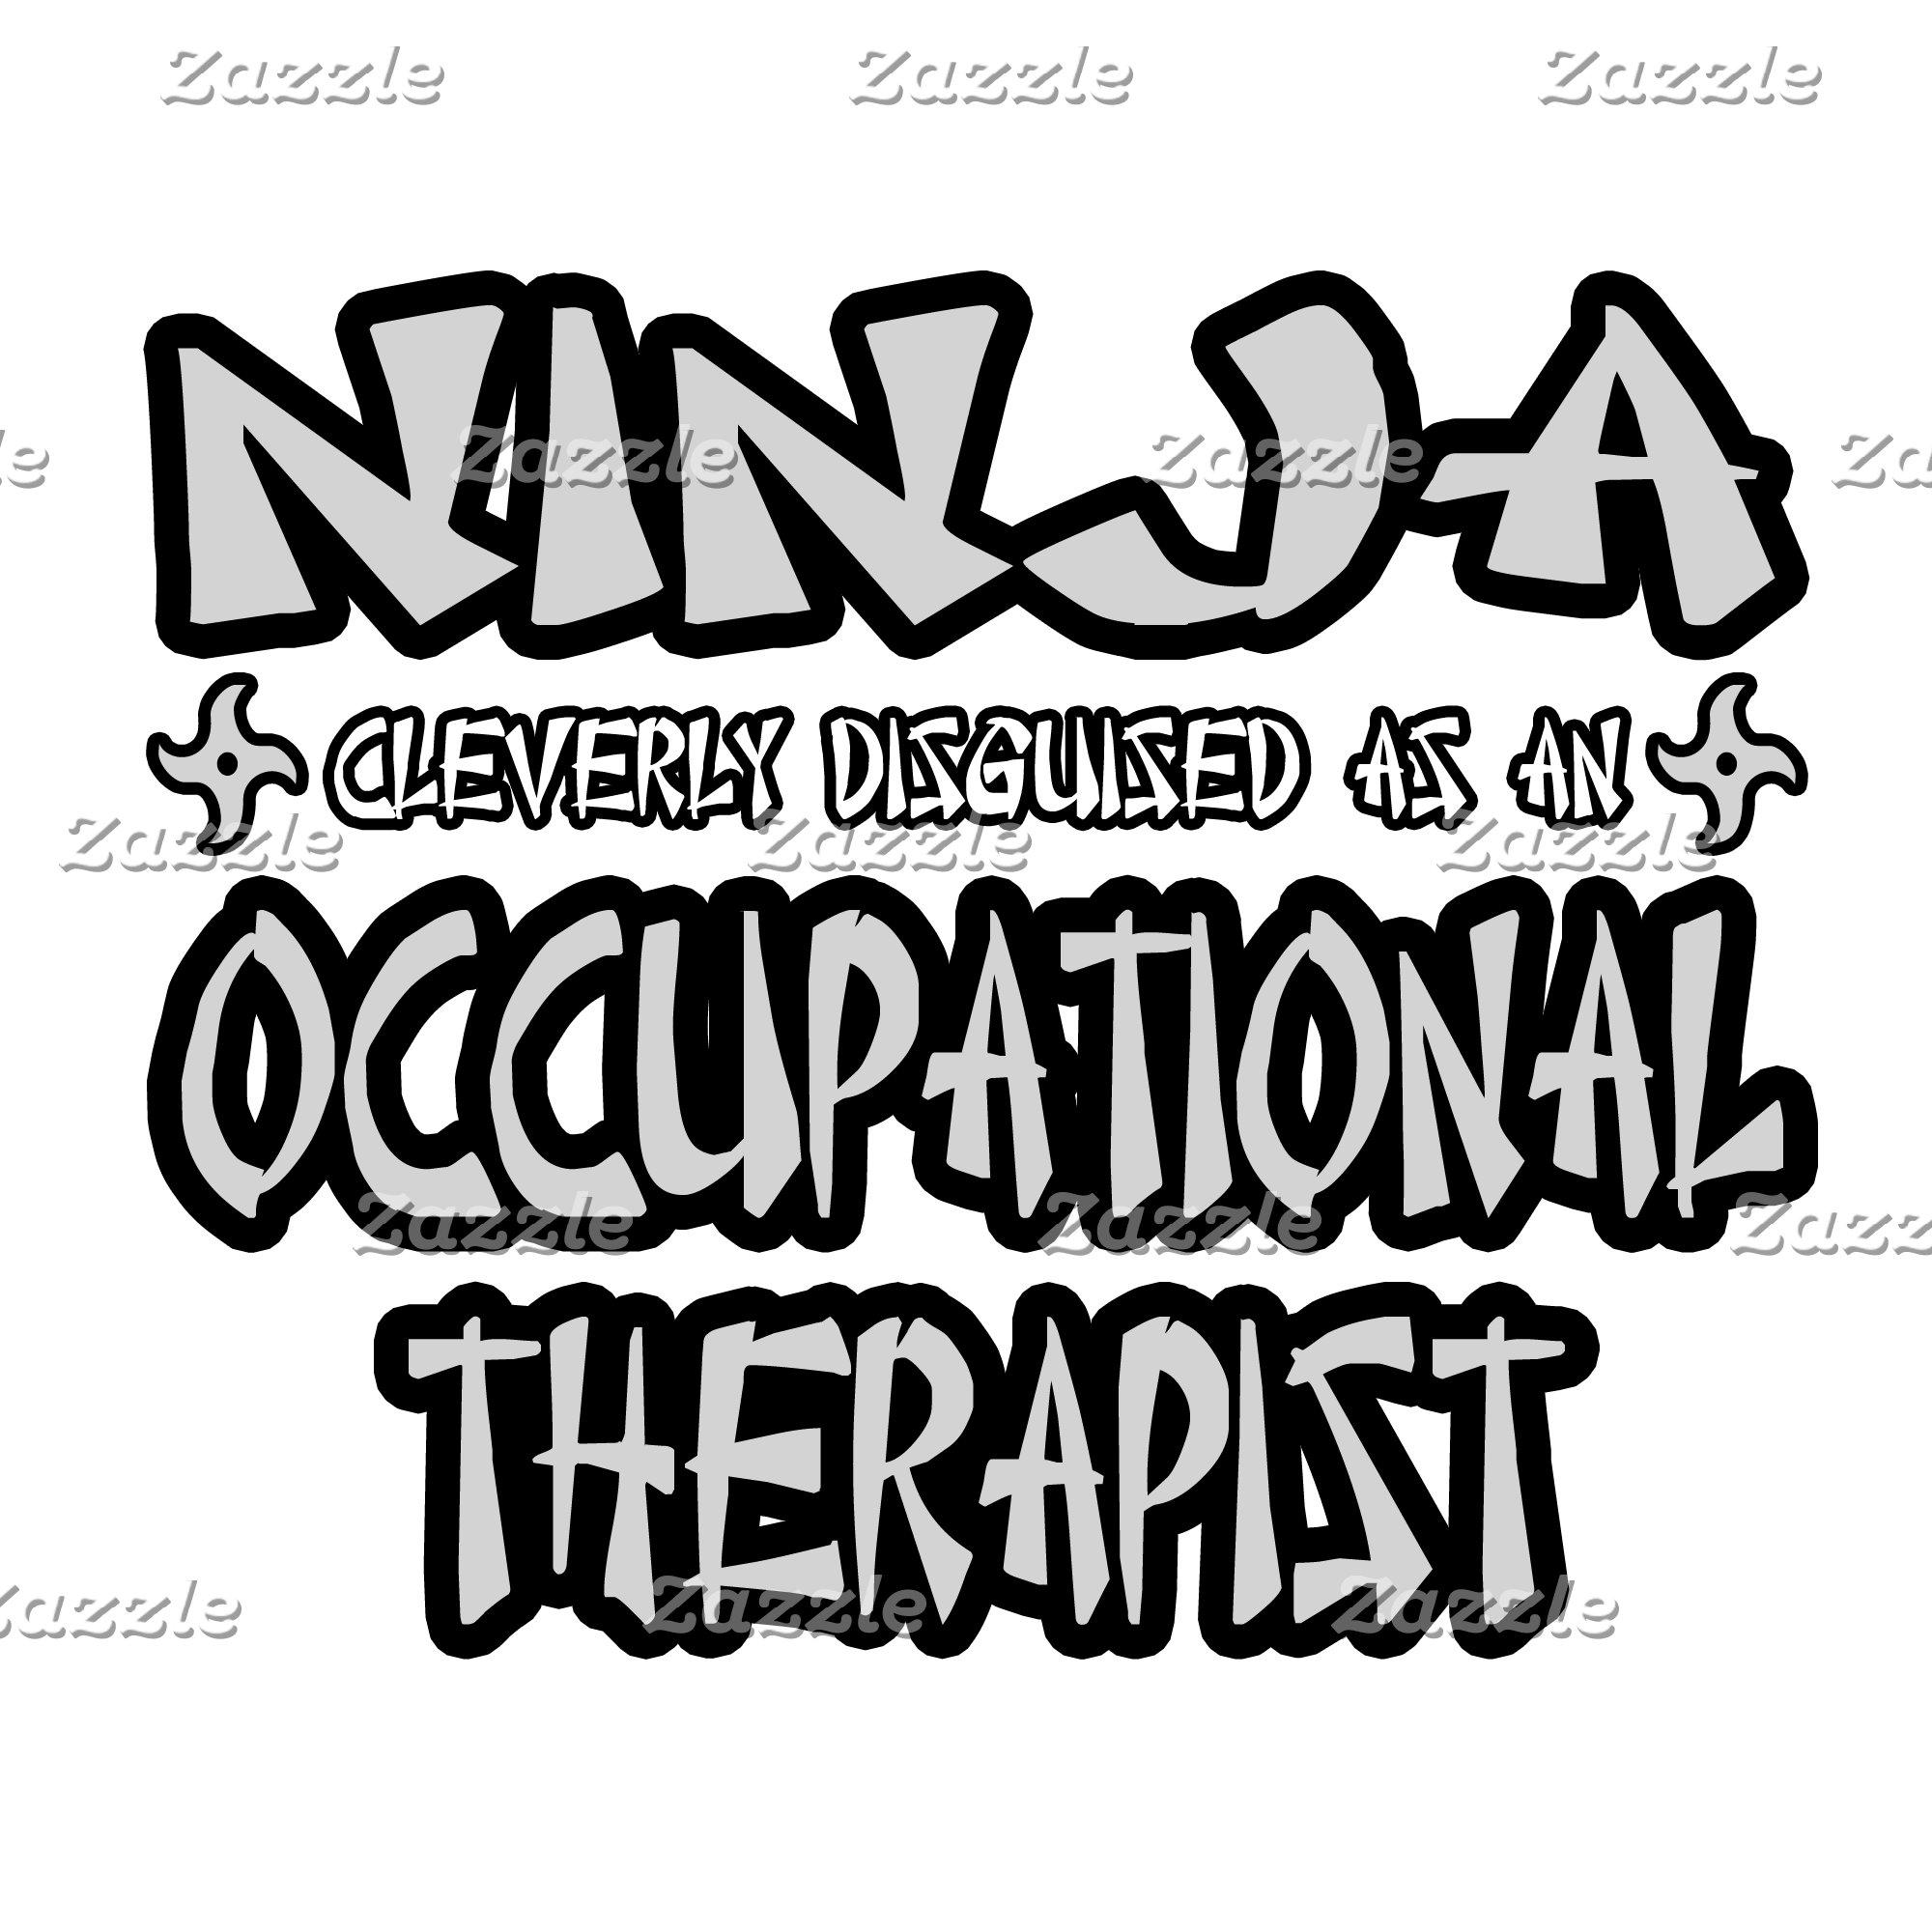 Ninja...Occupational Therapist